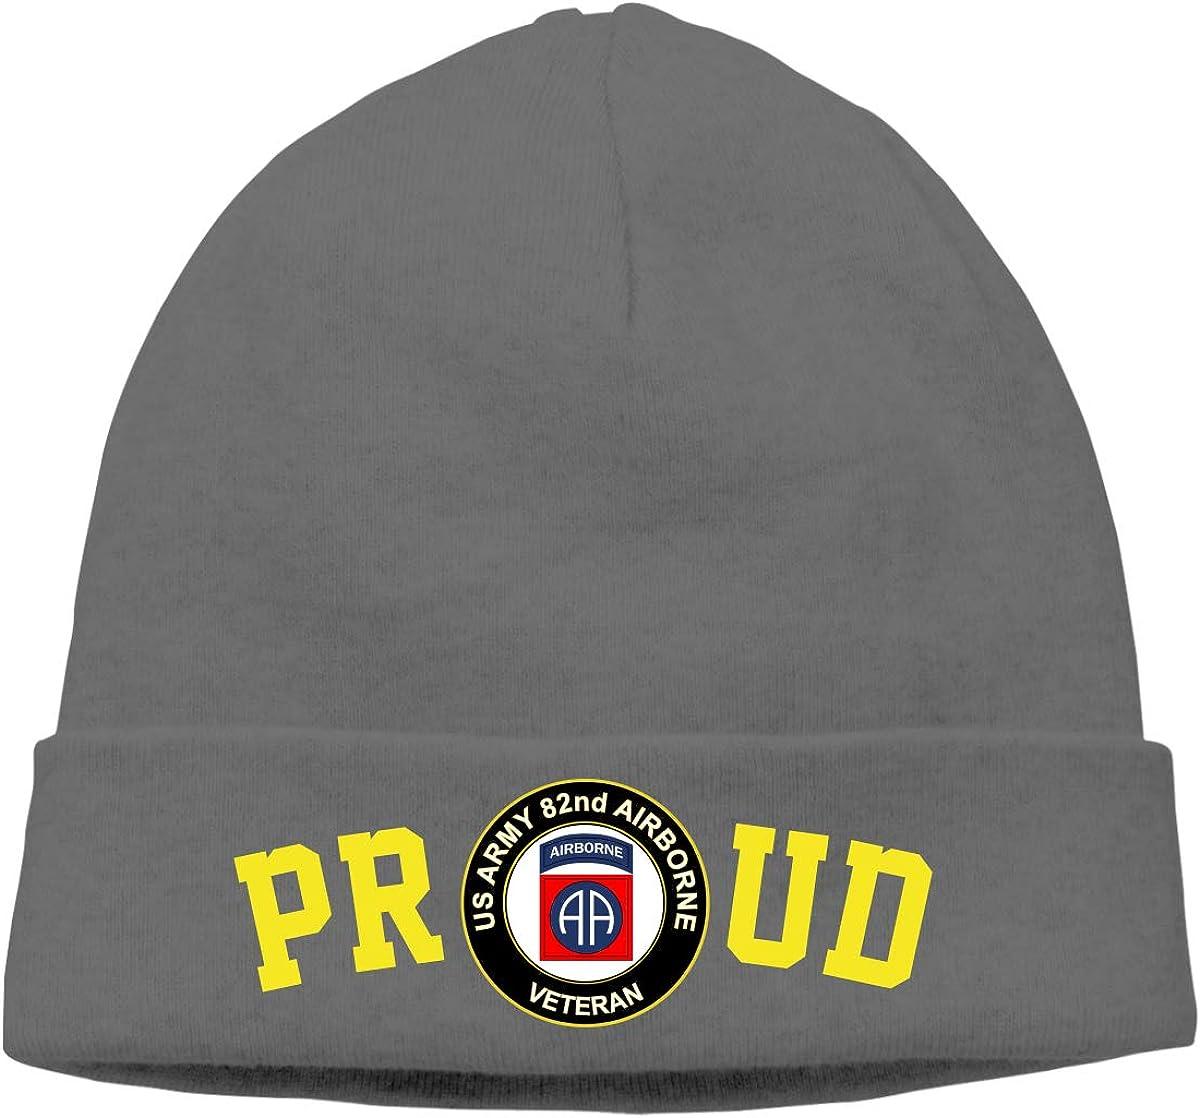 FORDSAN CP Proud US Army Veteran 82nd Airborne Mens Beanie Cap Skull Cap Winter Warm Knitting Hats.